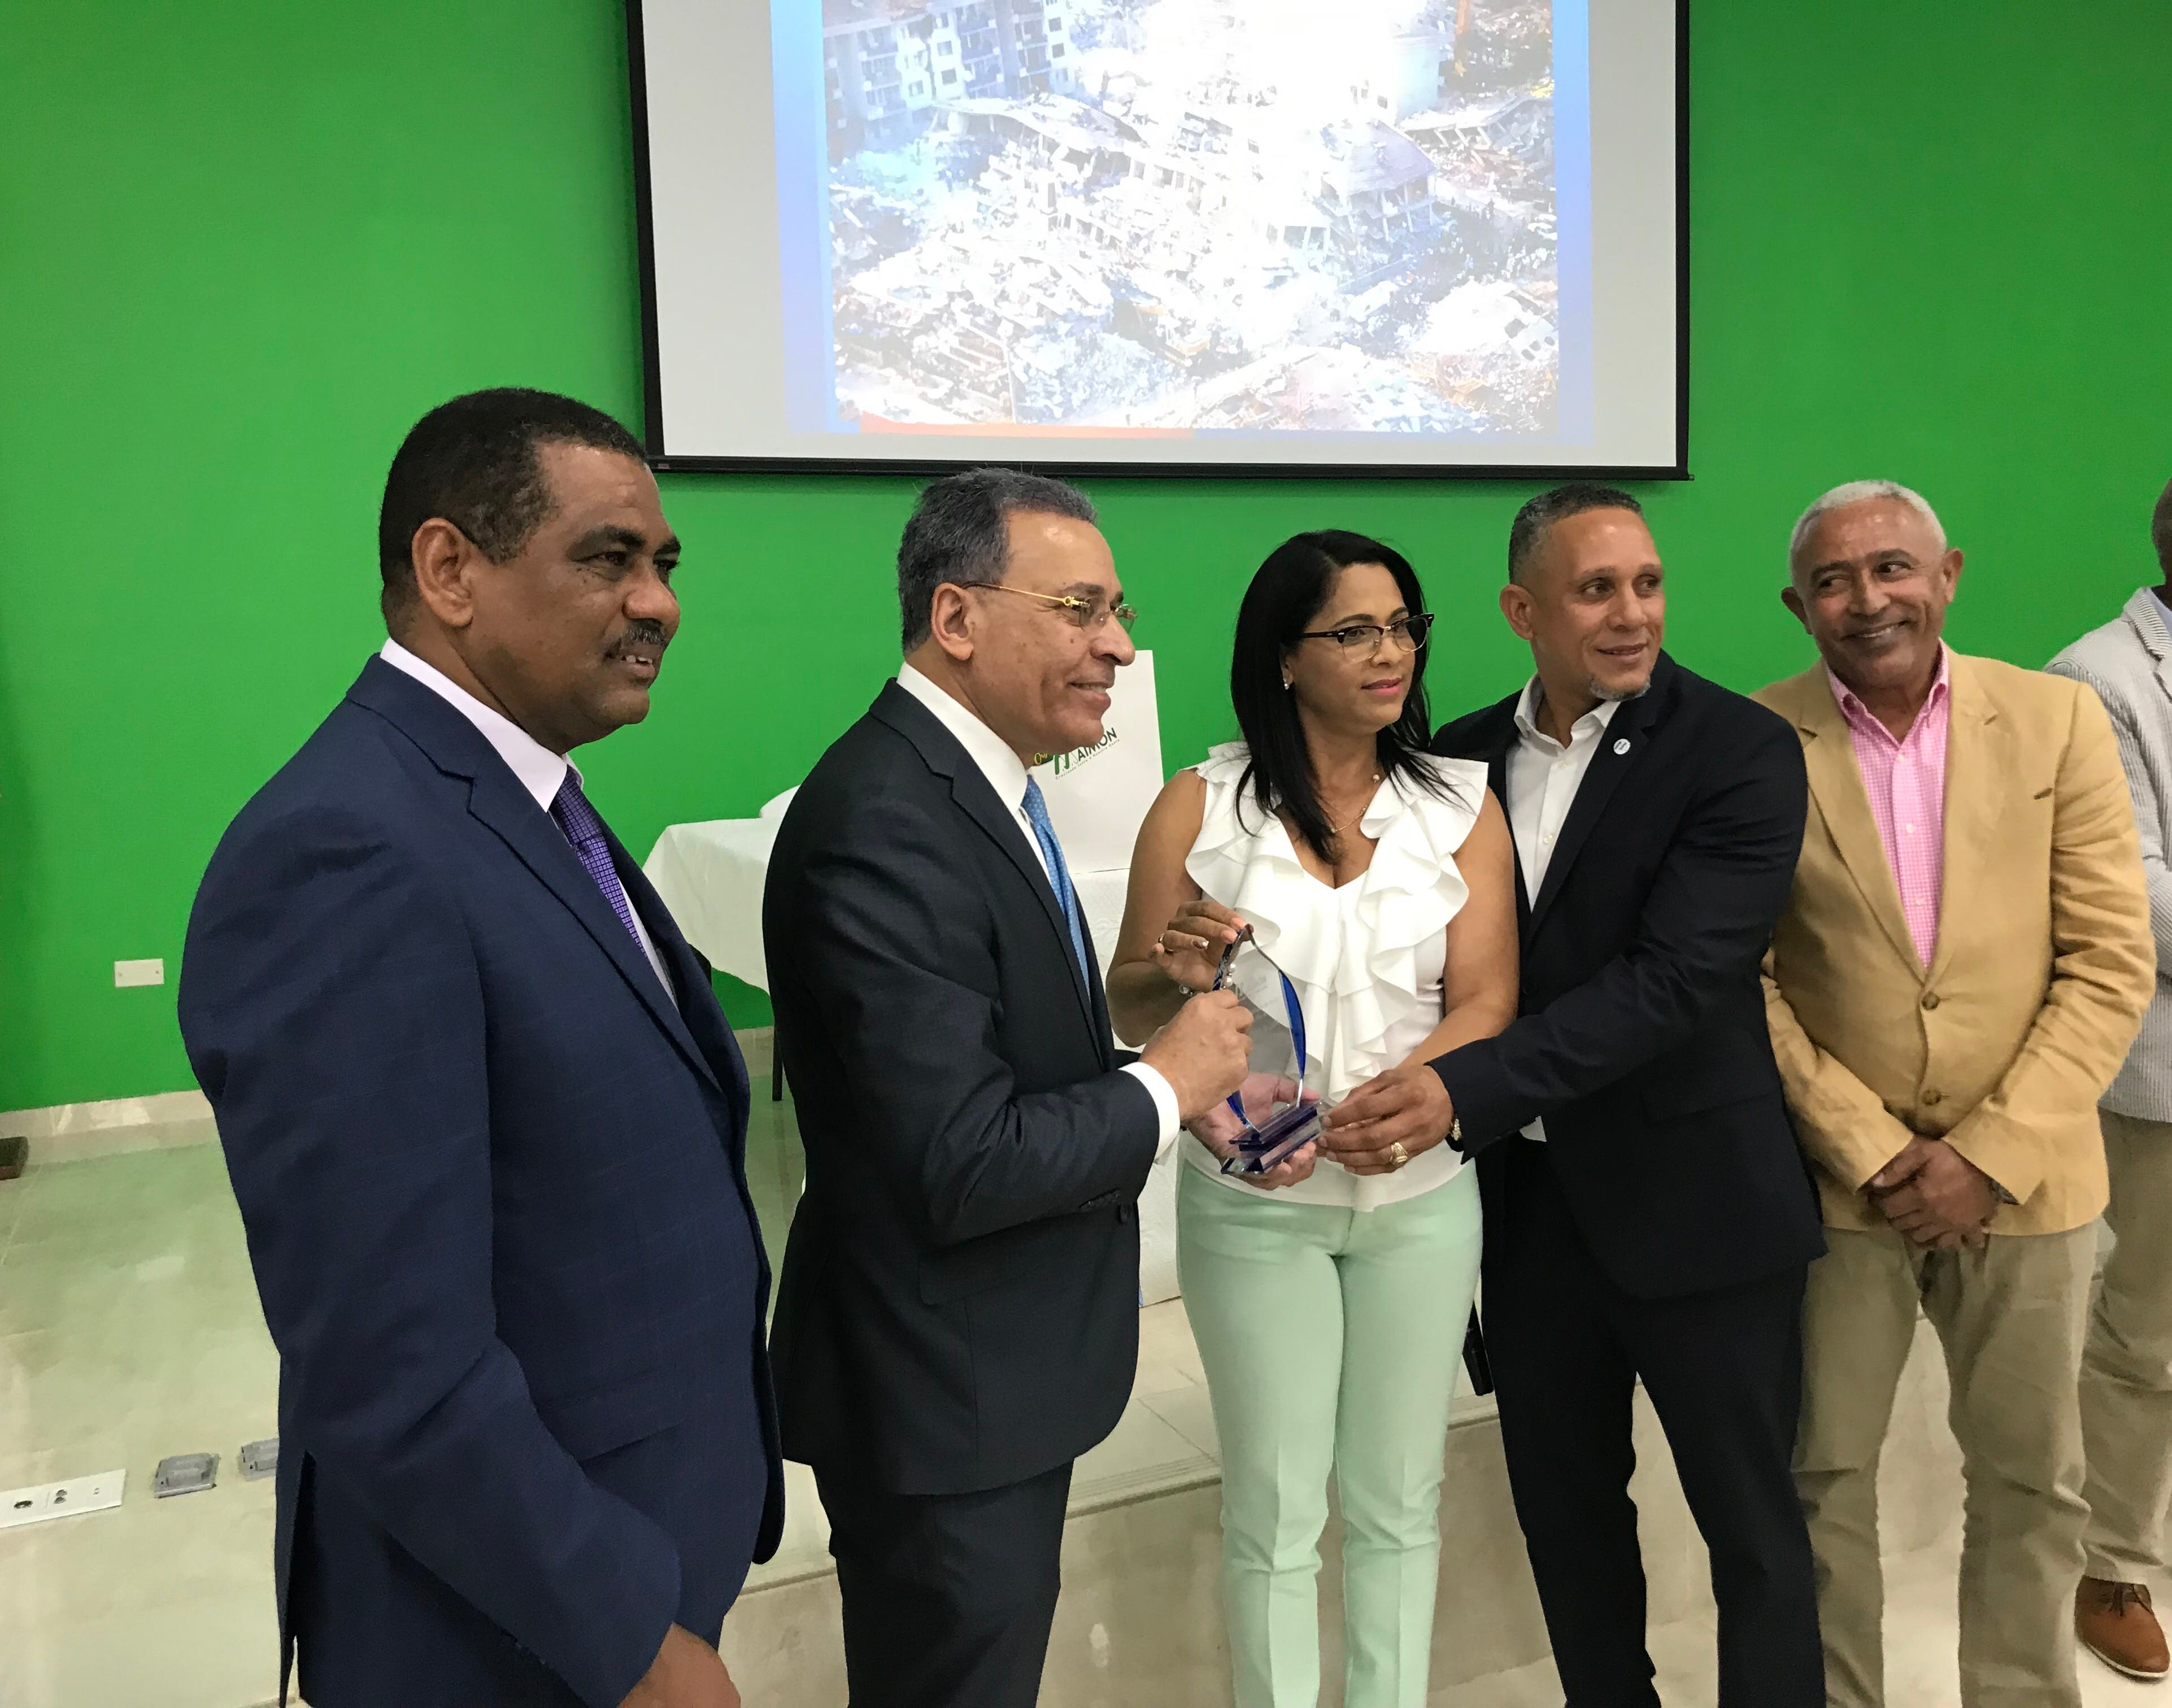 COOPMAIMON celebra conferencia sobre terremotos